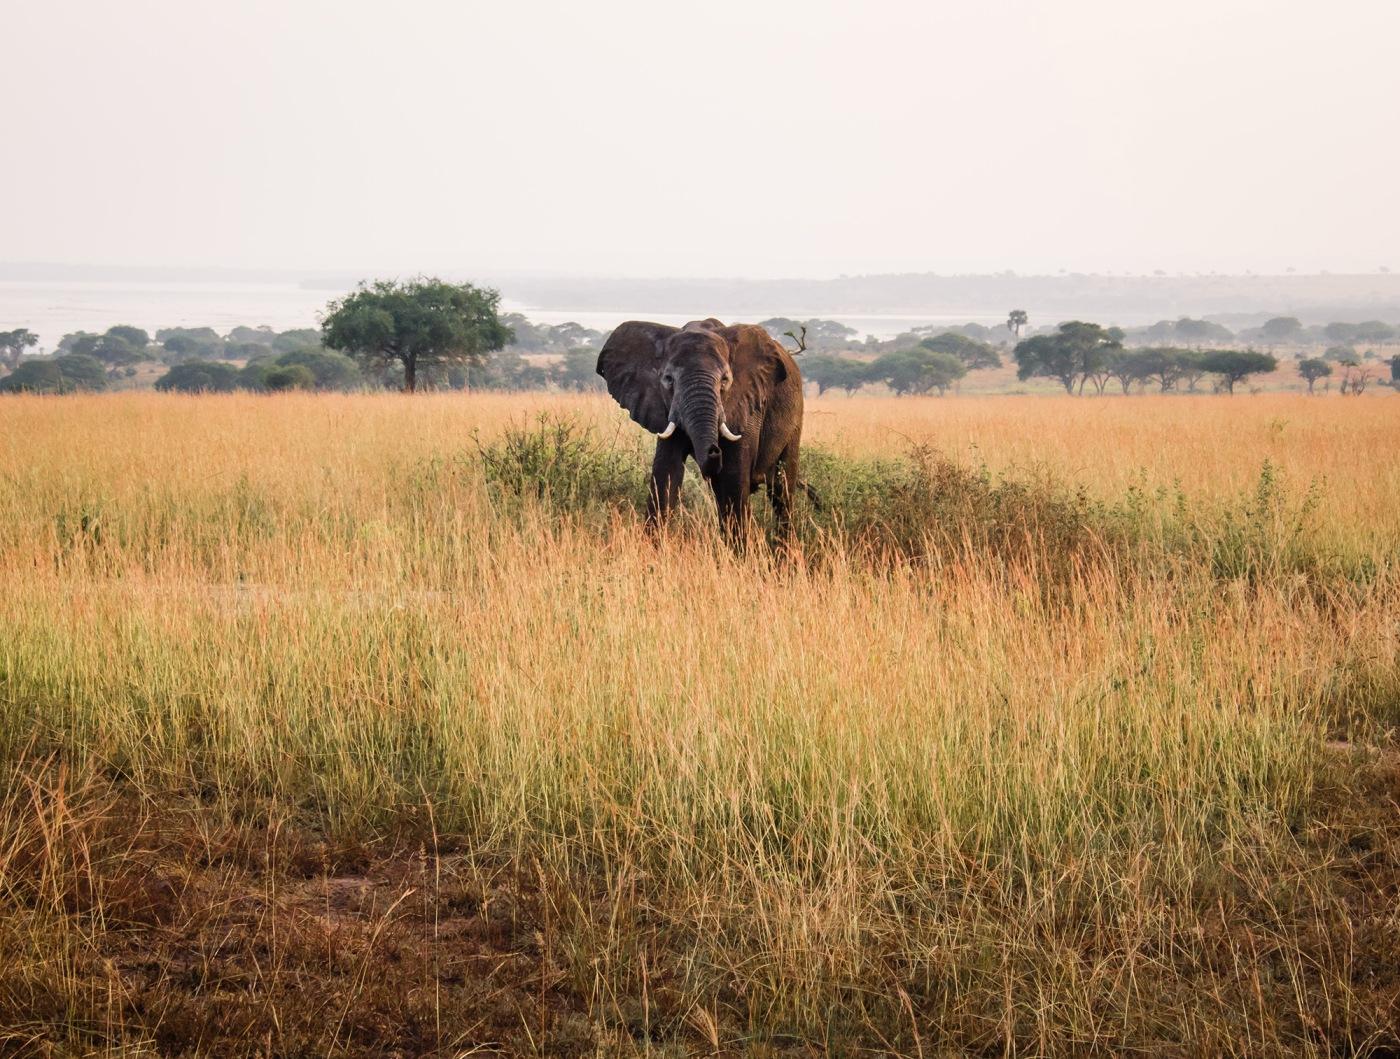 Savanna Grassland Habitat and animals